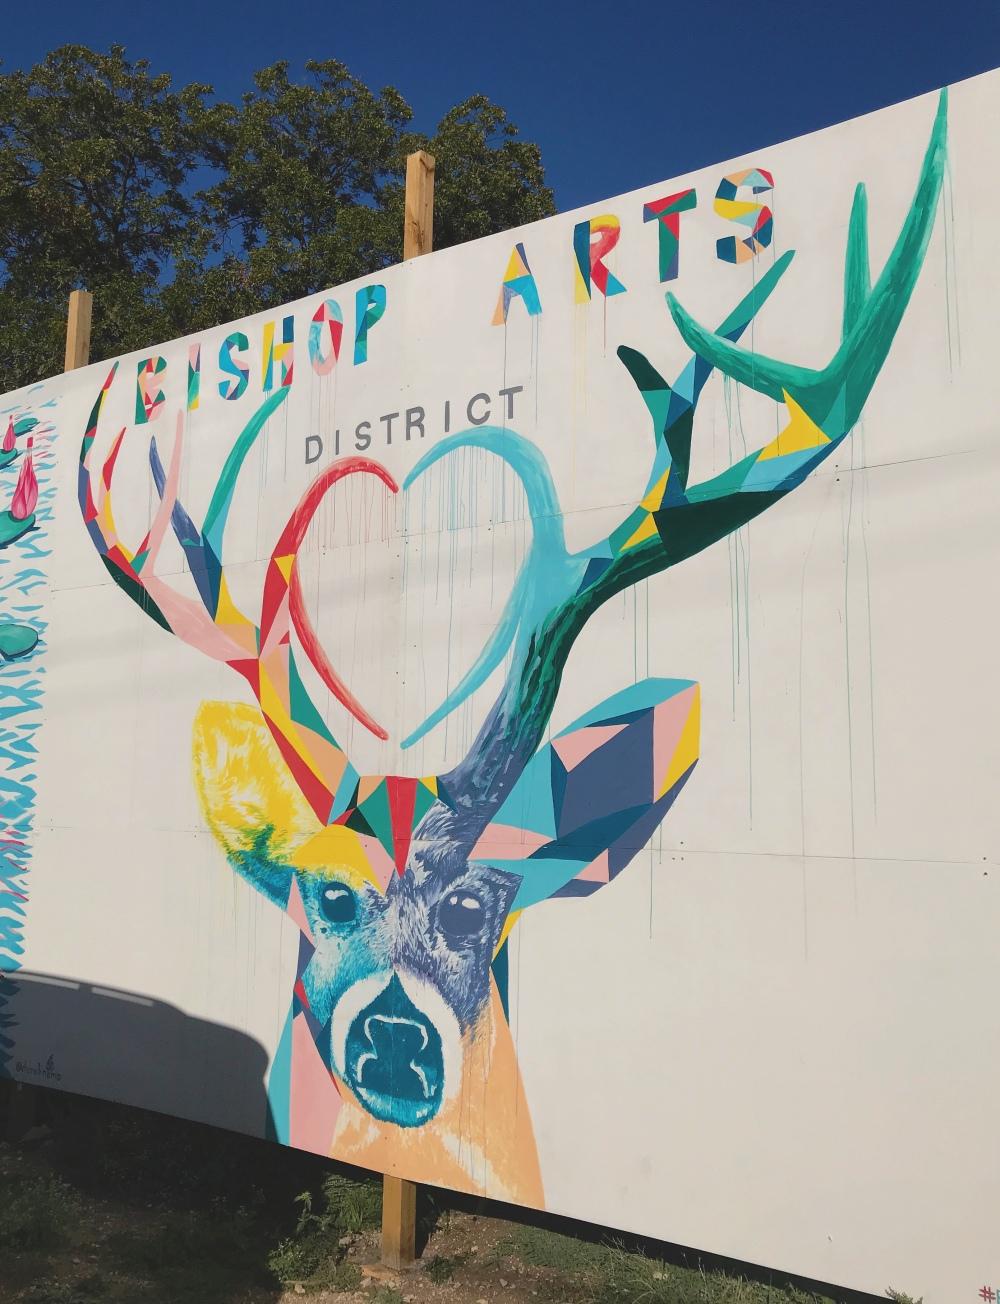 Bishop Arts Art